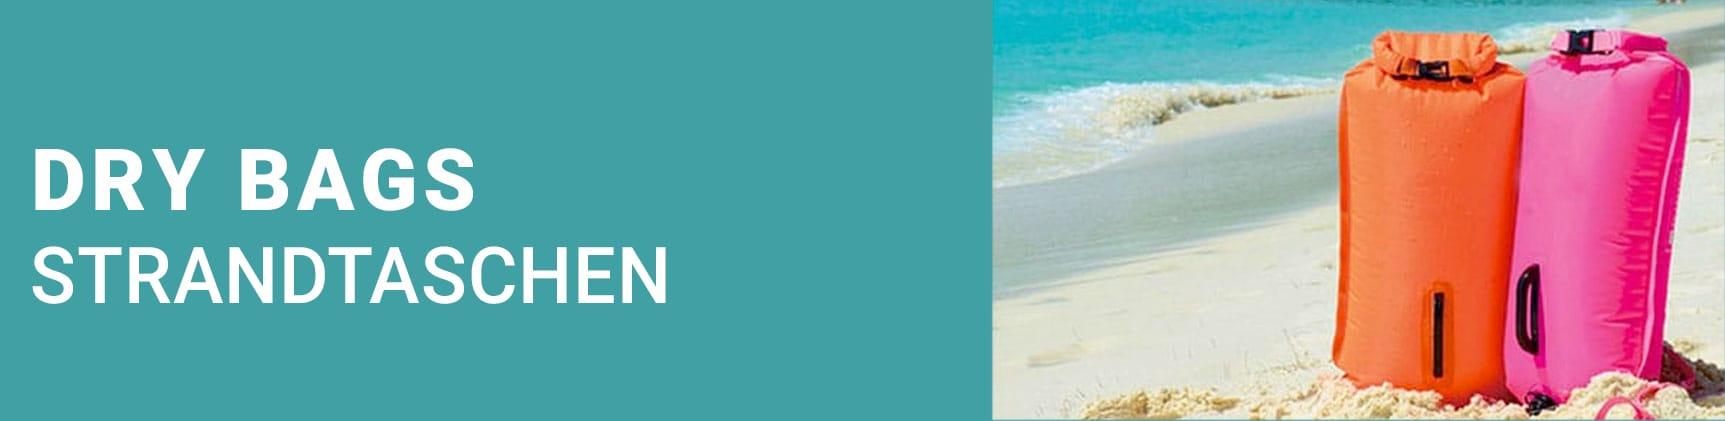 Dry Bags & Strandtüchern online bestellen